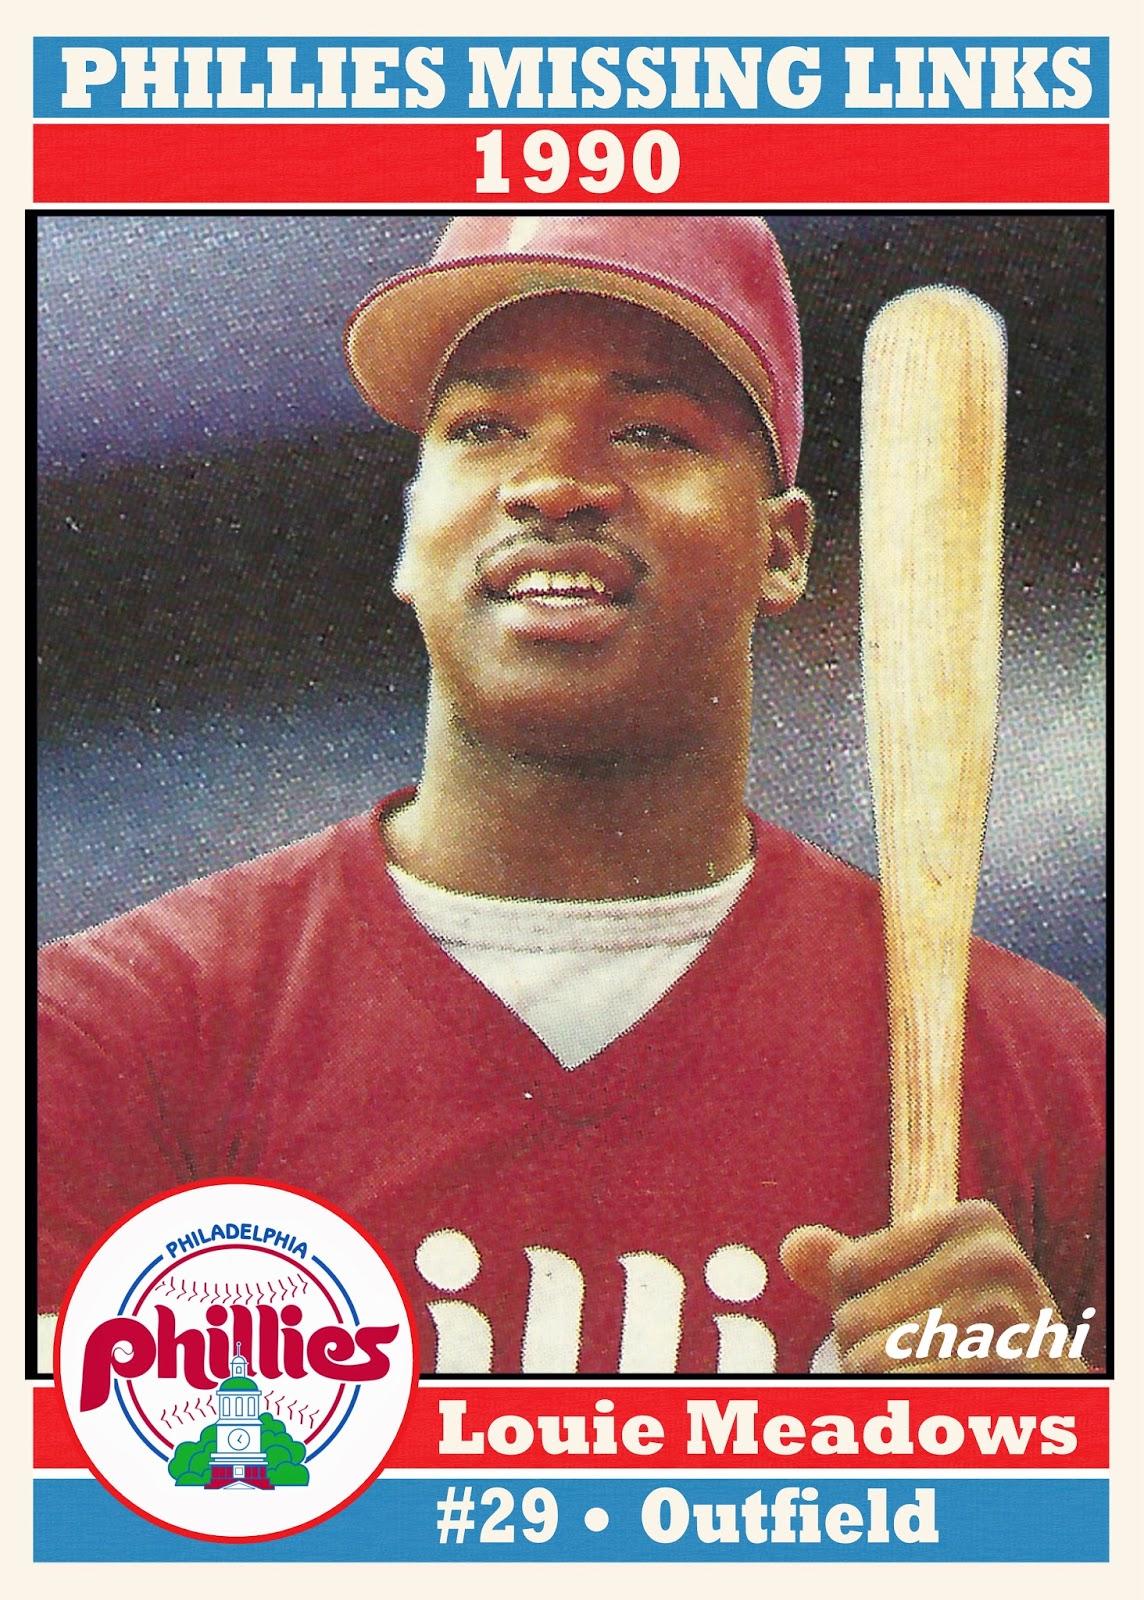 Sports Memorabilia, Fan Shop & Sports Cards 1988 CMC Maine Phillies 25-cd Team Set Rickey Jordan